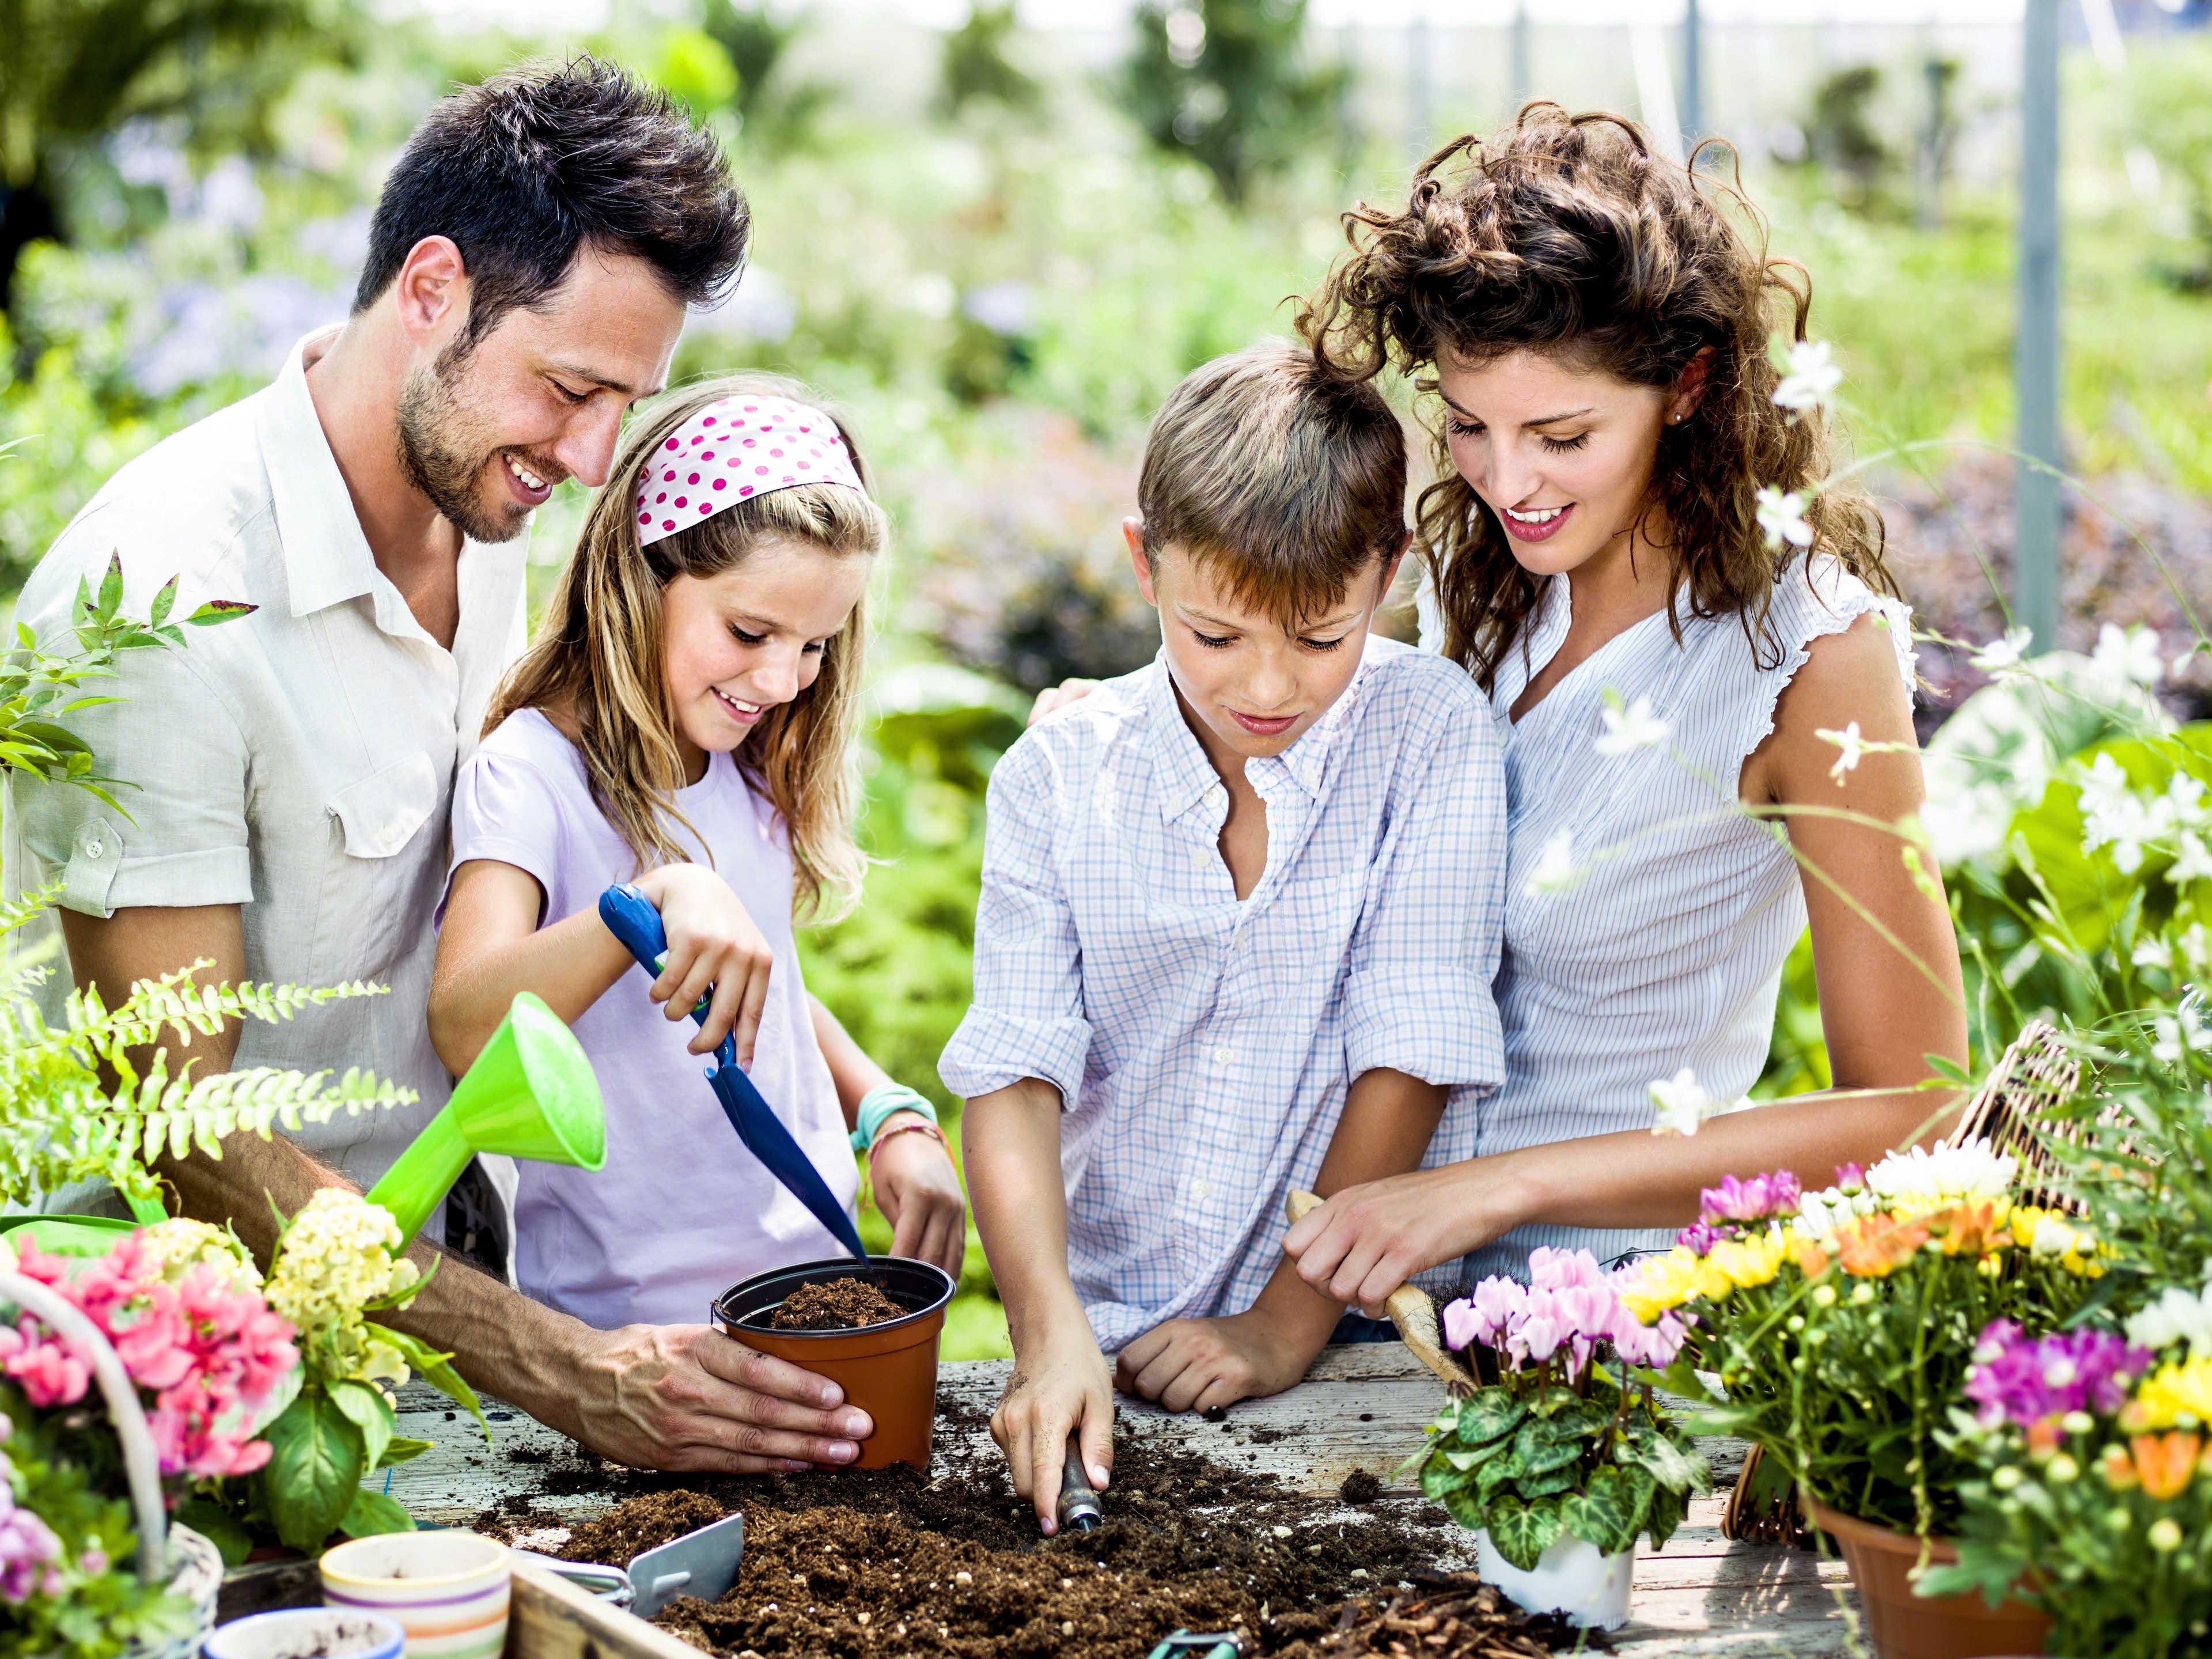 family_gardening-3840x2880.jpg